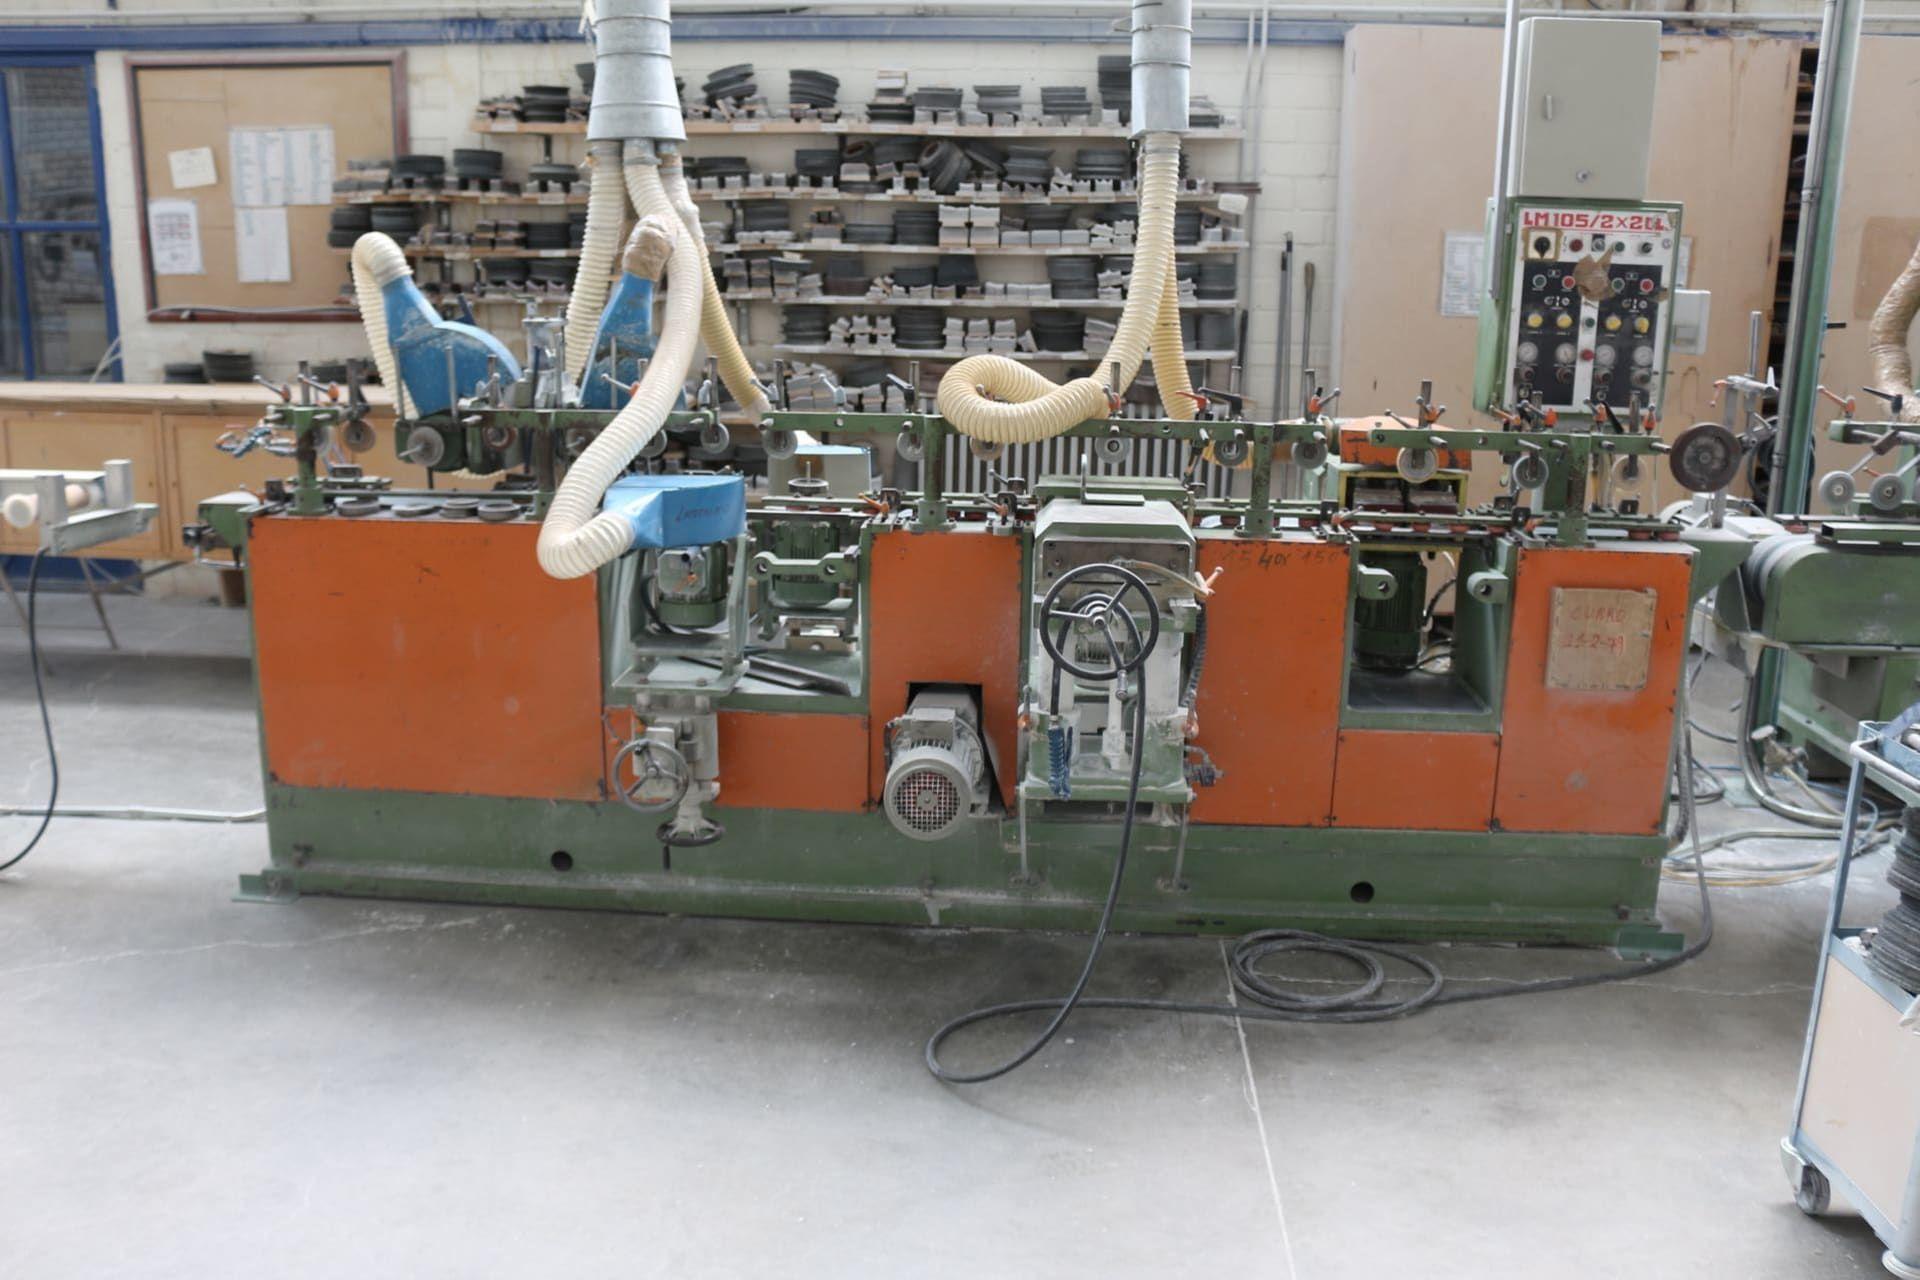 BALENCIAGA LM 105 2x2 CL Profil-Schleifmaschine